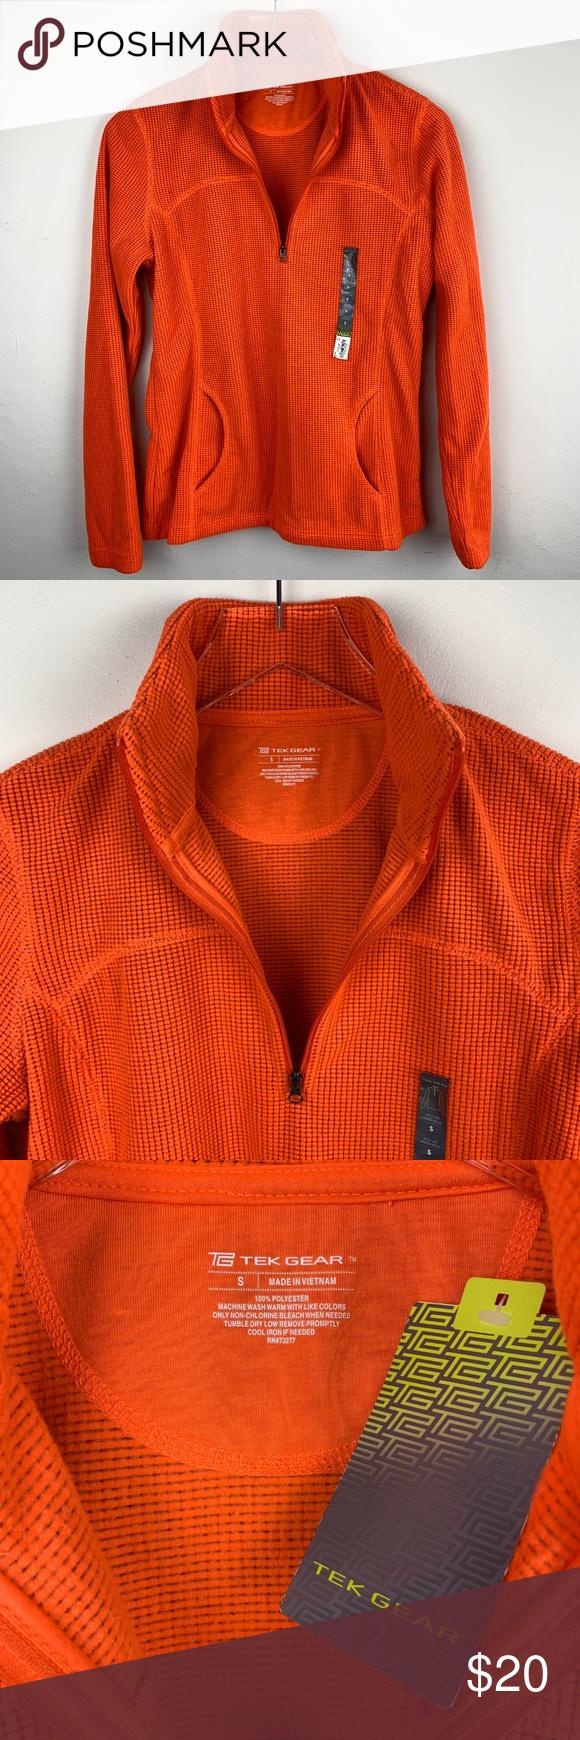 TEK GEAR — Orange Running Half Zip Track Jacket S NEW WITH